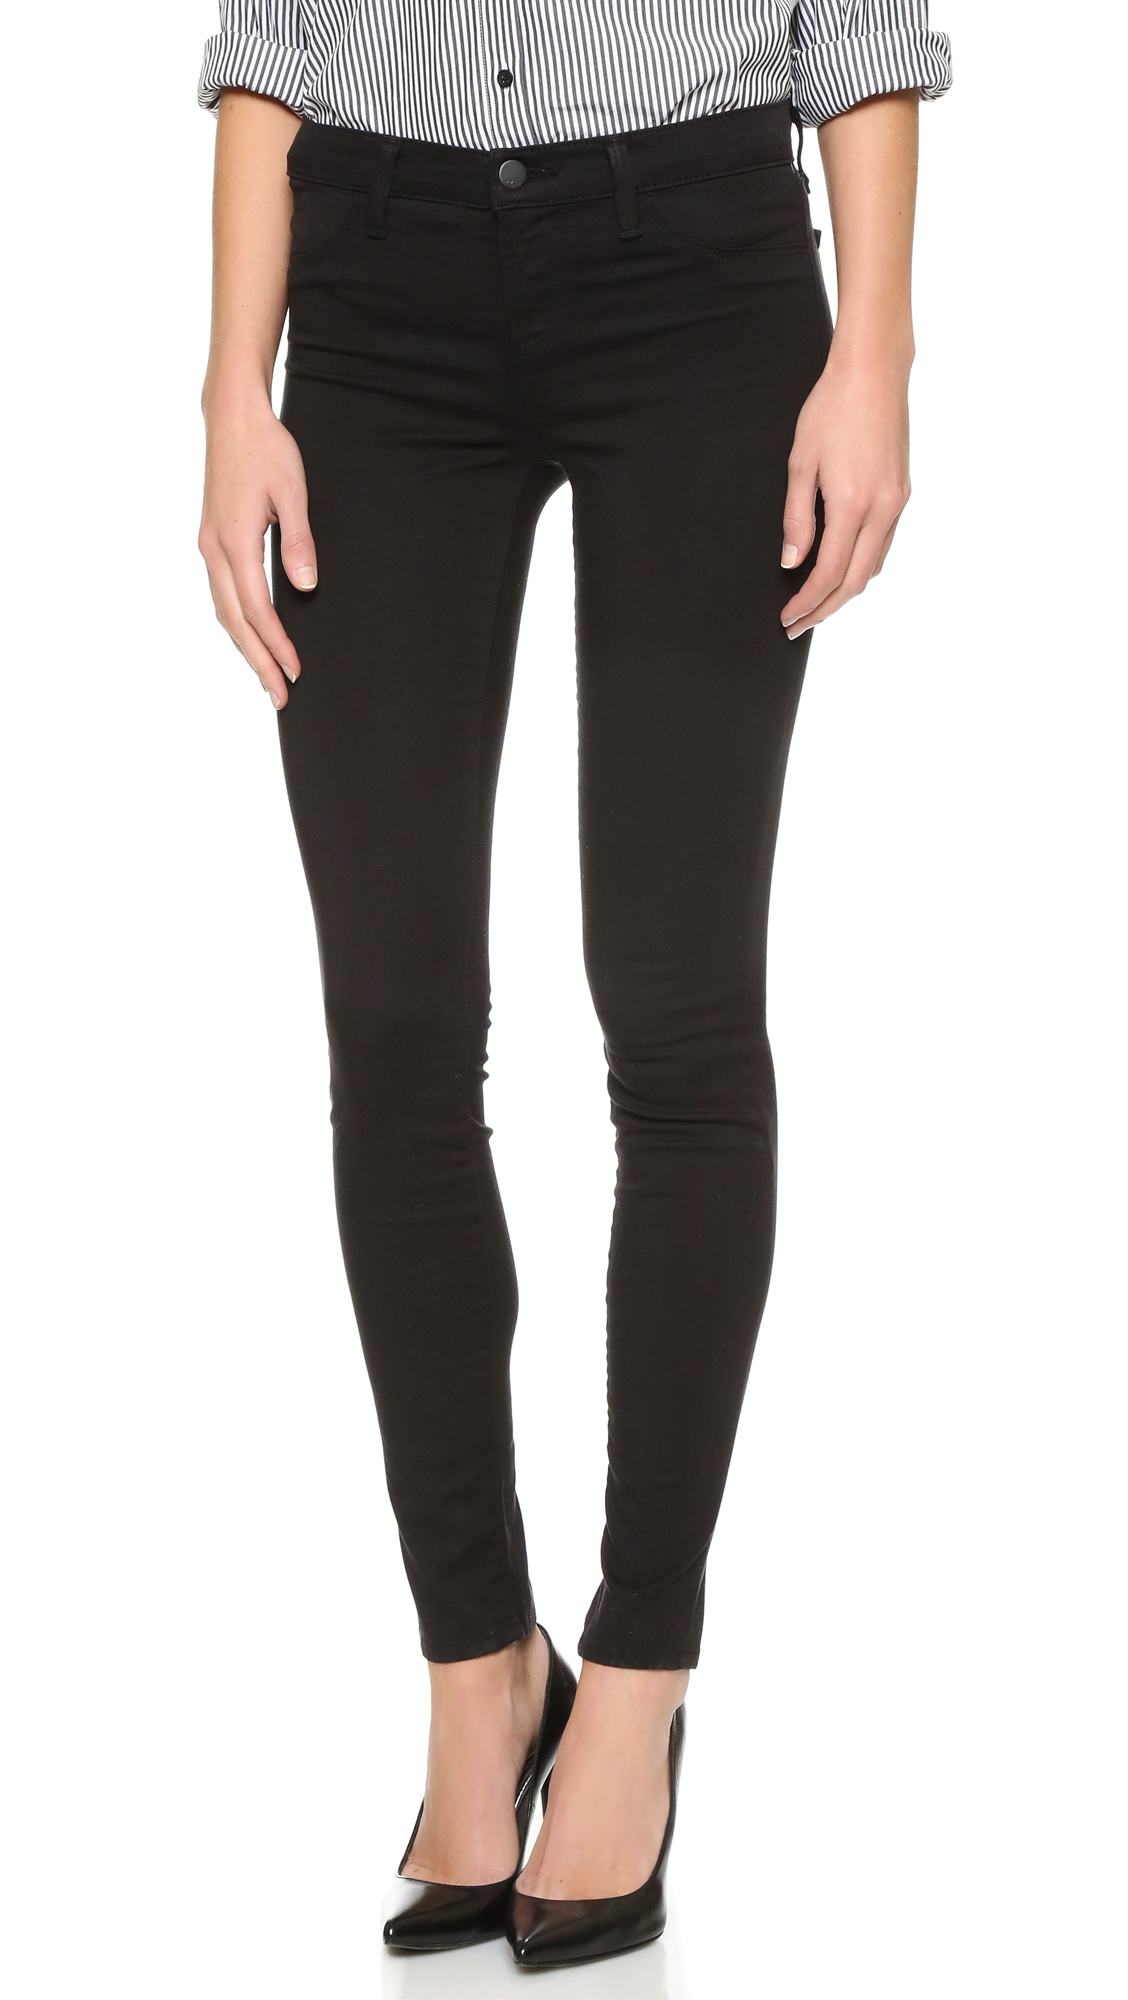 J Brand 485 Super Skinny Luxe Sateen Jeans - Black